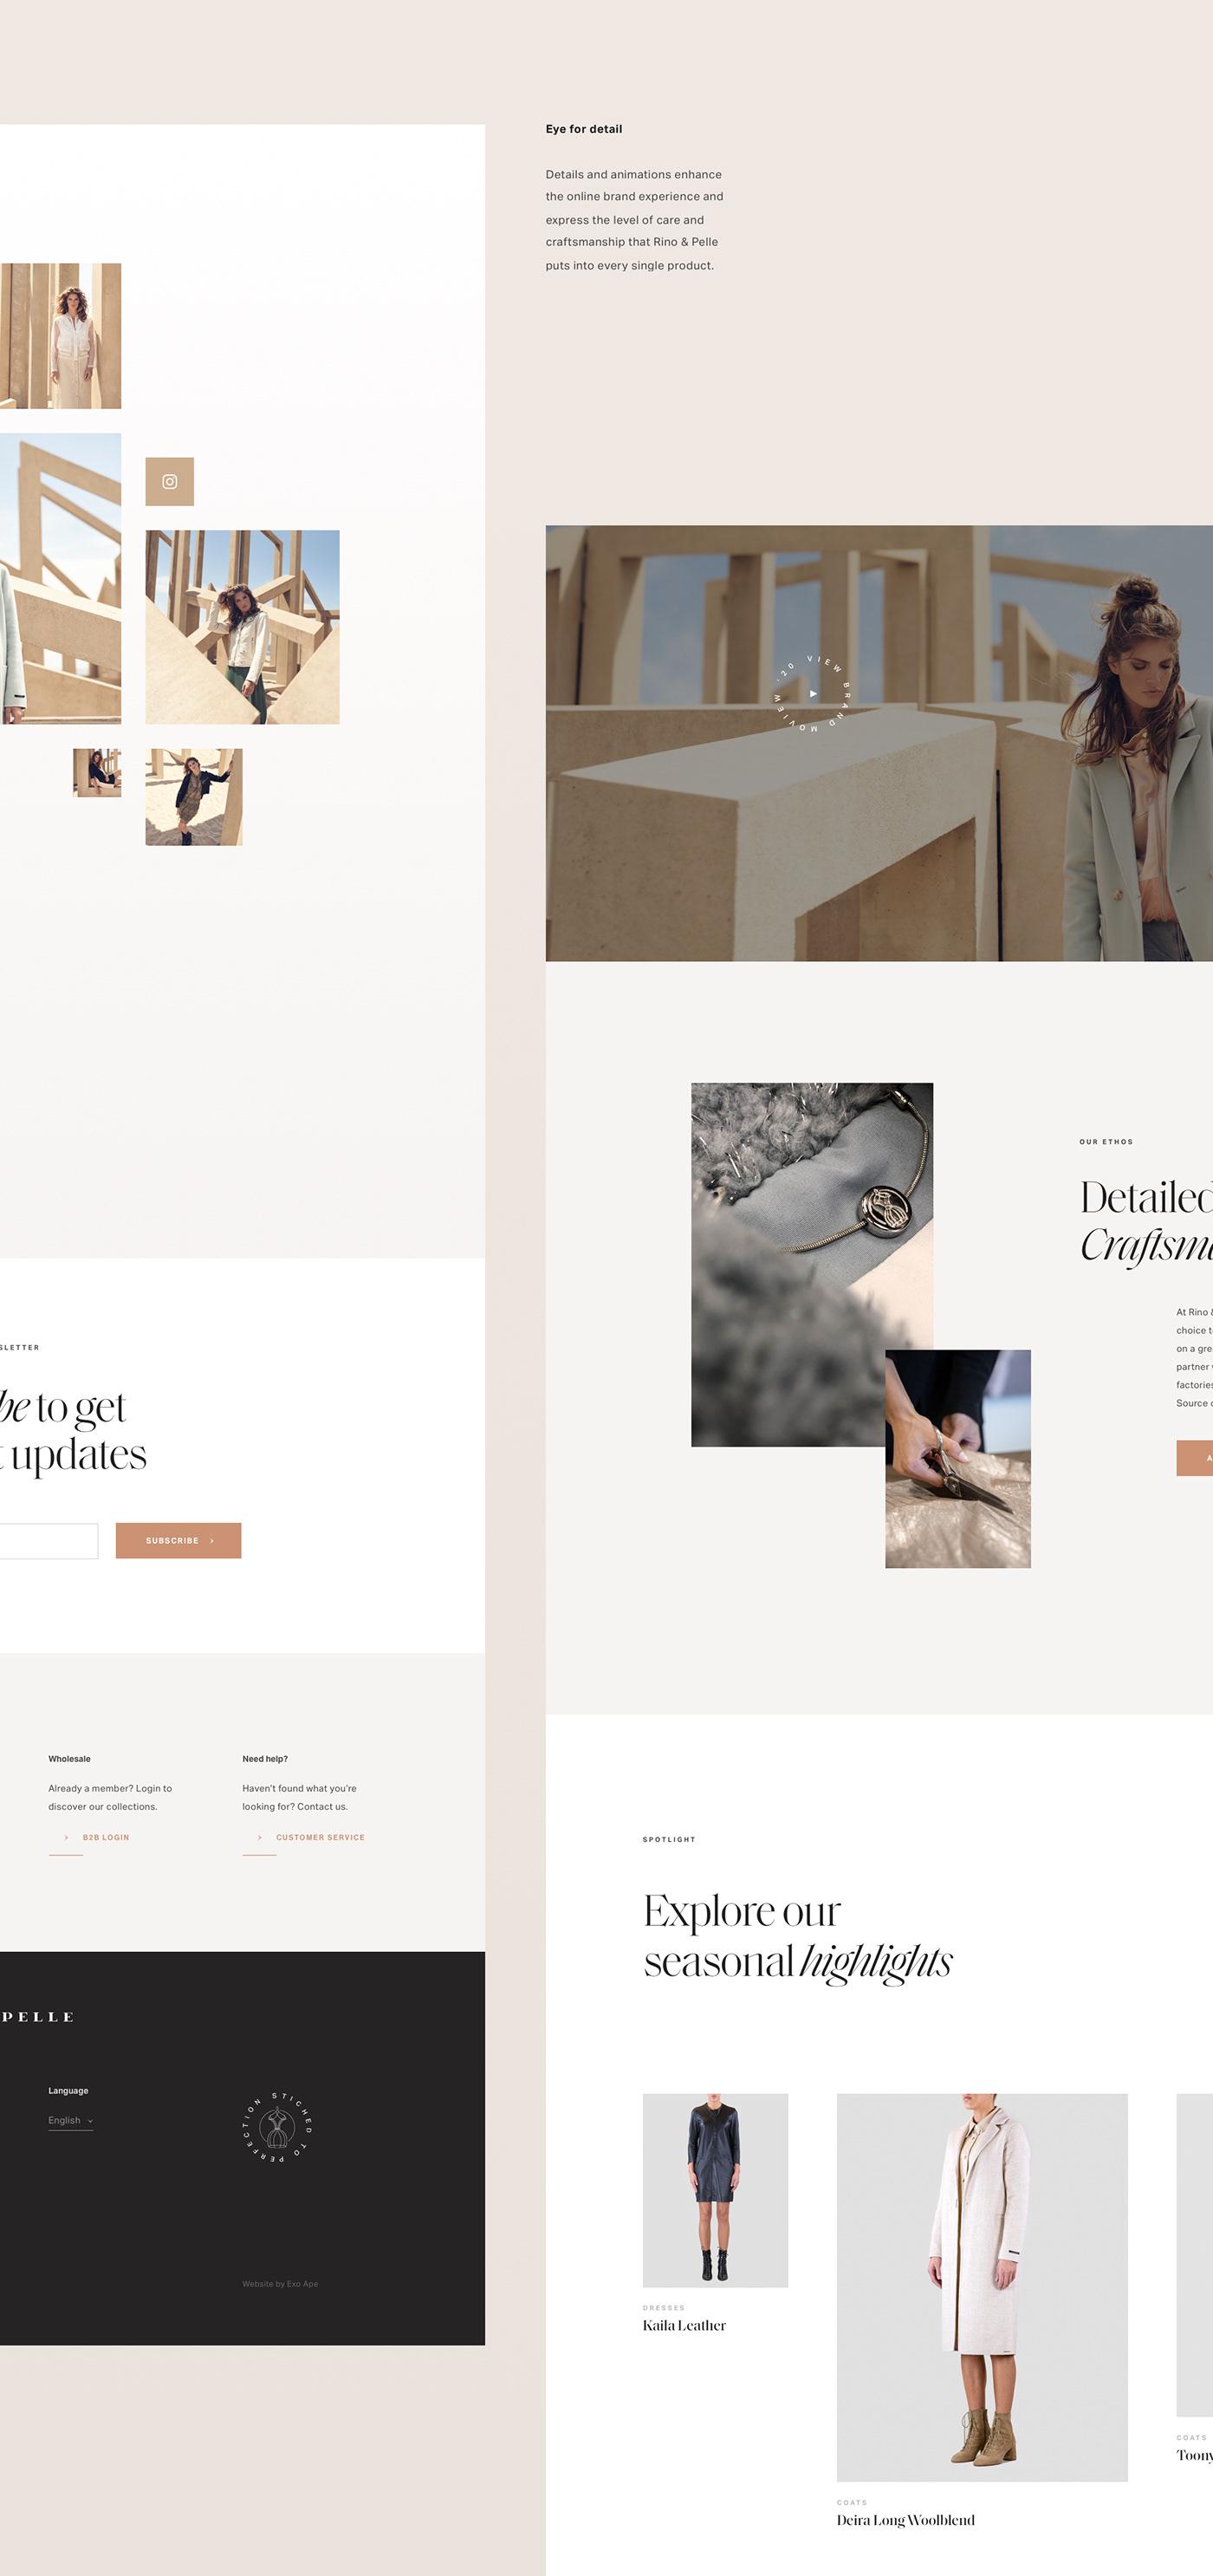 website design for women's fashion brand